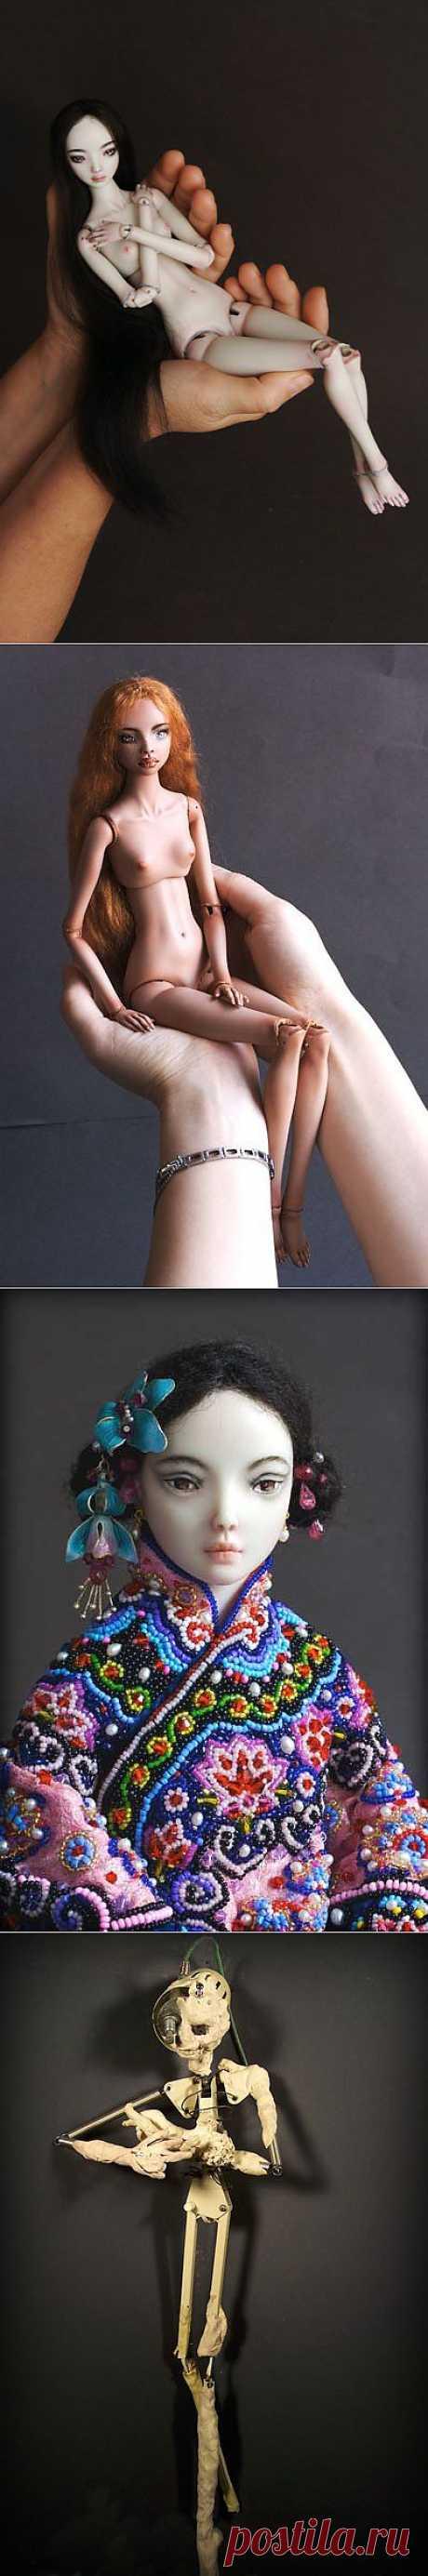 Marina Bychkova - Это для каких детей игрушки (151 фото - 7.81Mb) » Фото, рисунки